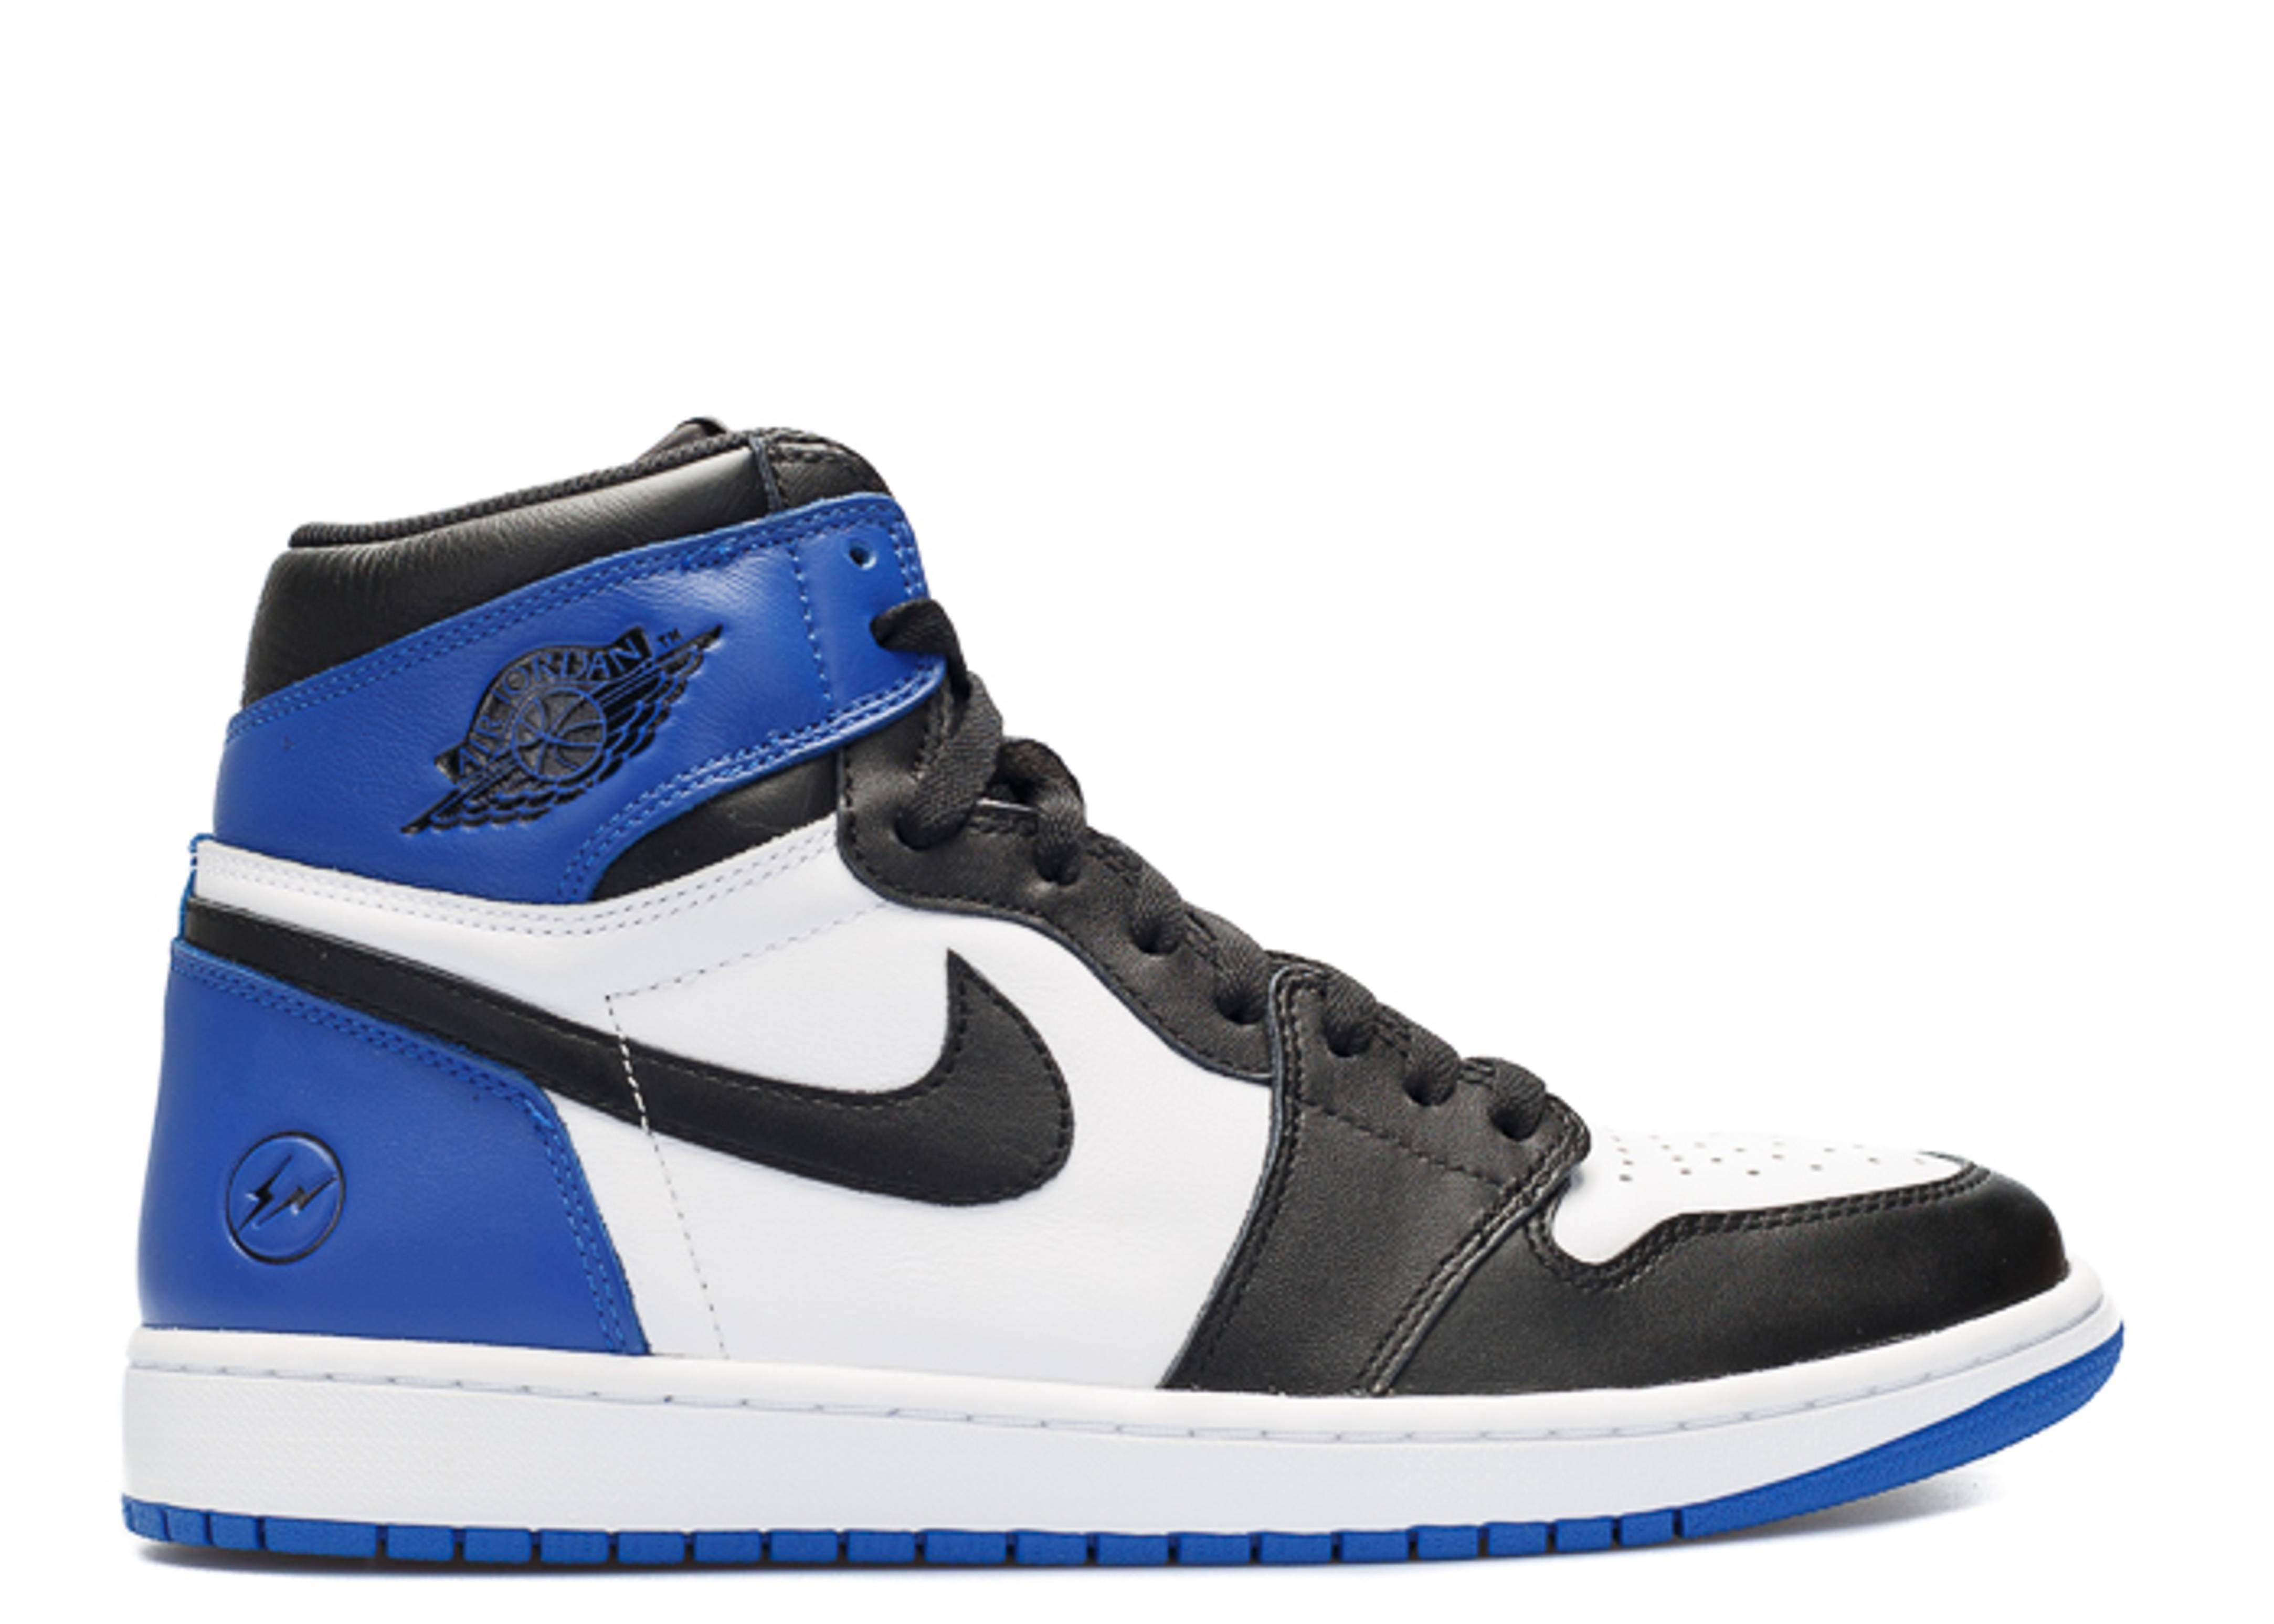 cc2eded0d03 Air Jordan 1 X Fragment